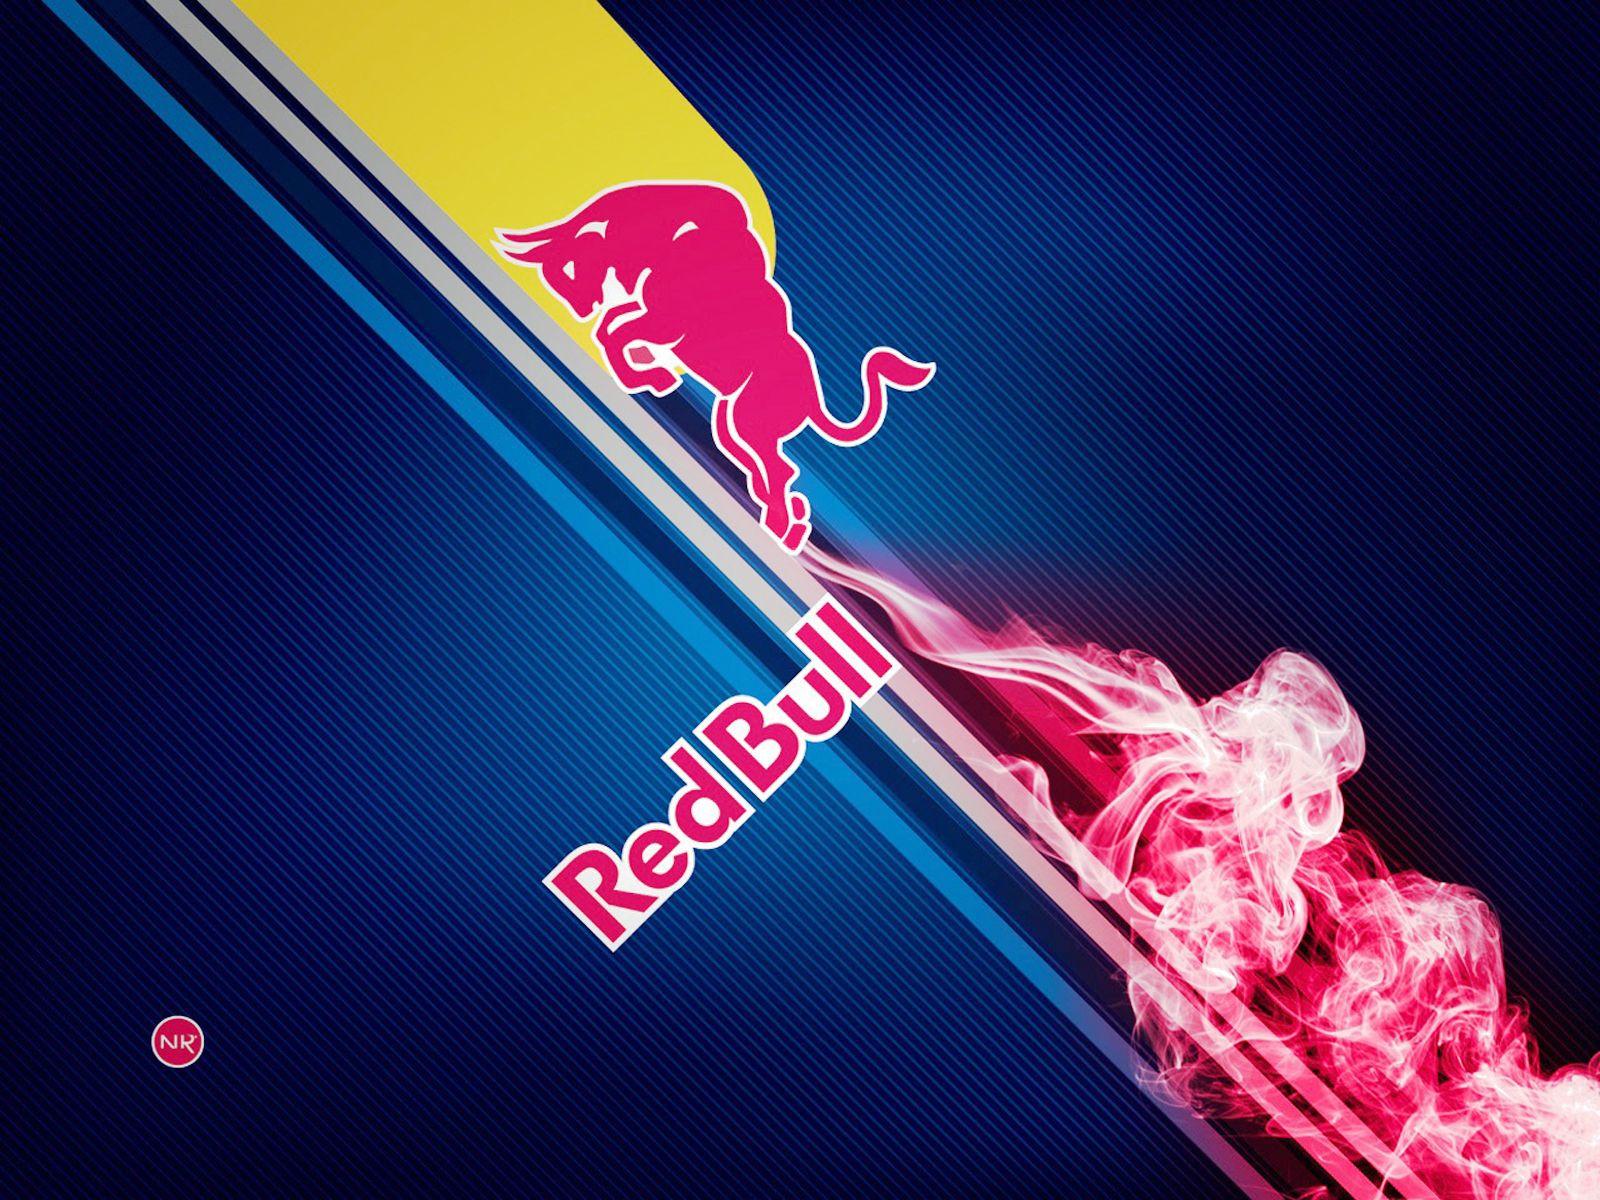 red bull logo wallpaper hd for desktop collection | しし | pinterest